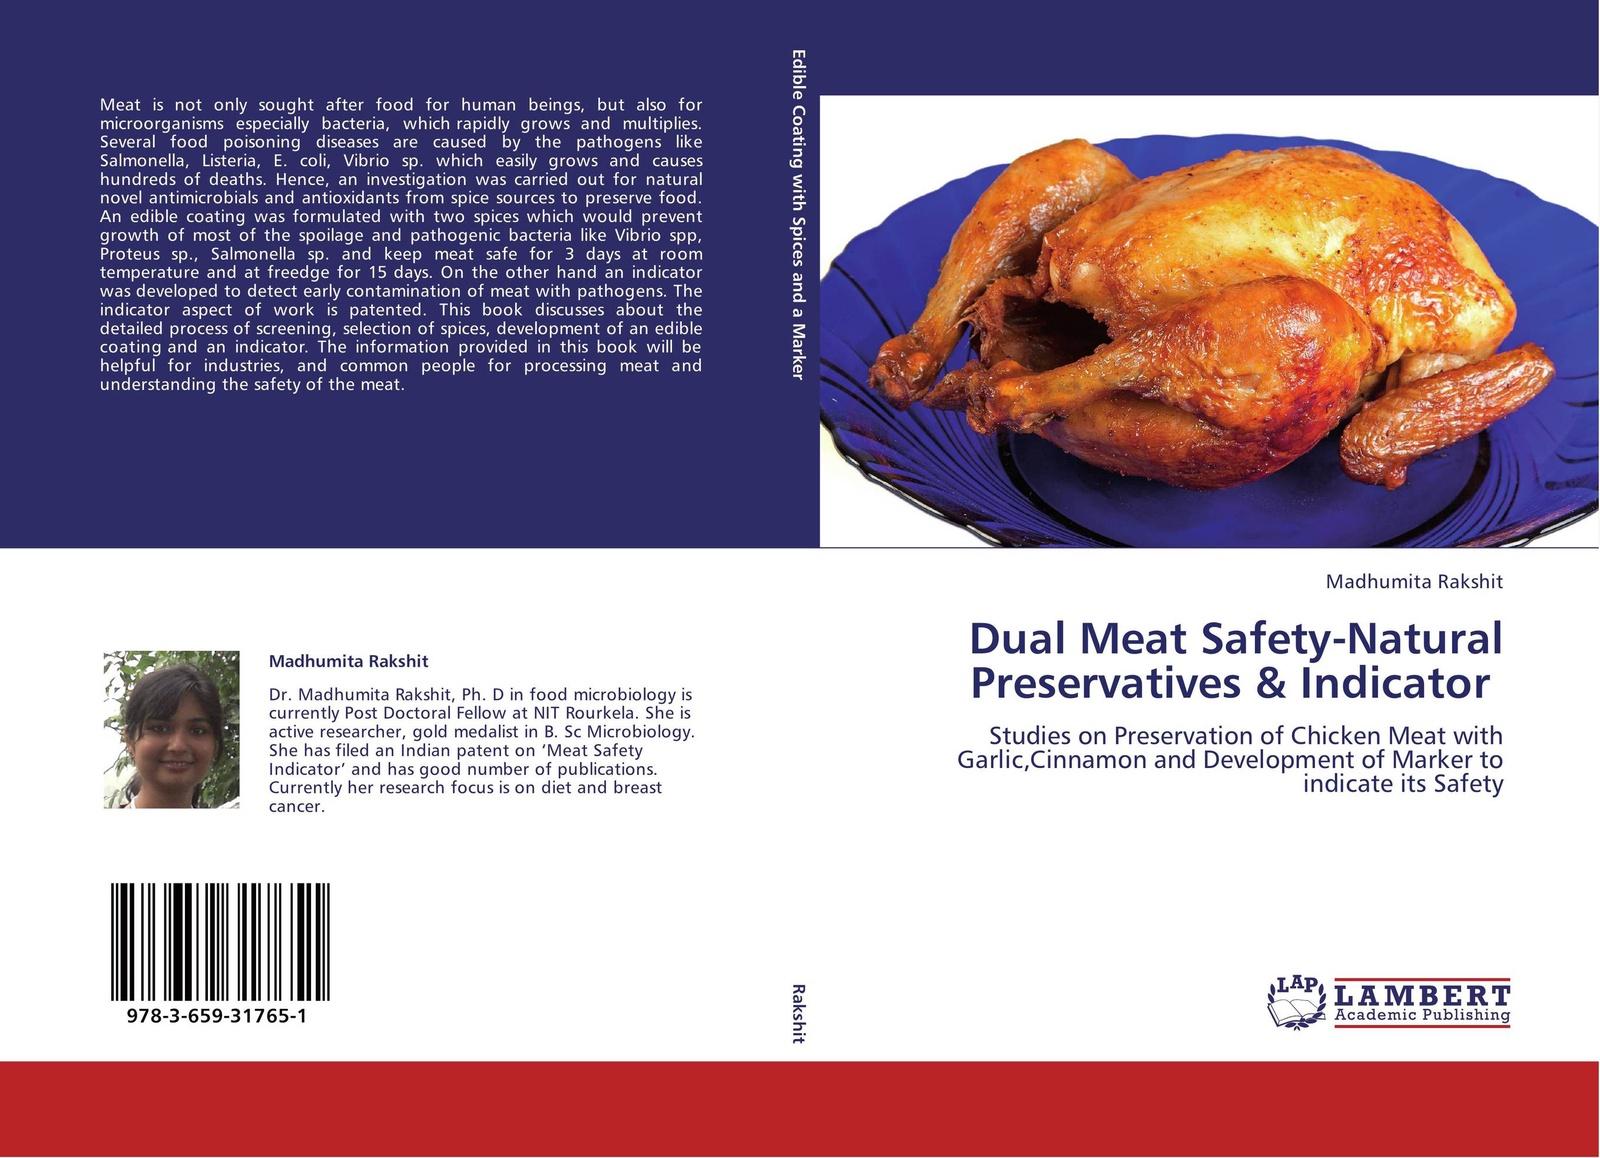 купить Madhumita Rakshit Dual Meat Safety-Natural Preservatives & Indicator по цене 4749 рублей